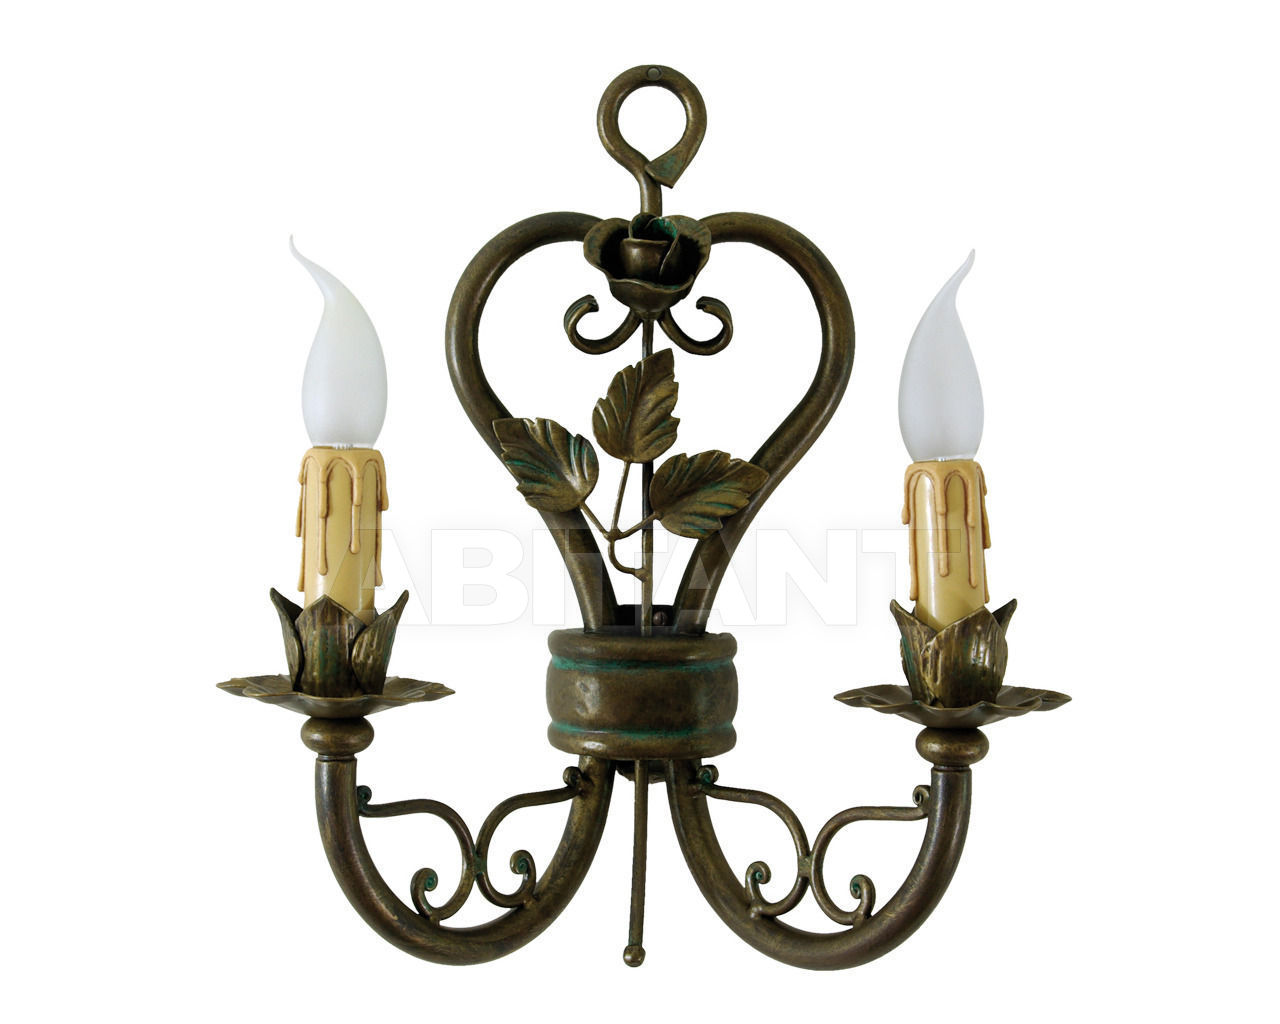 Купить Светильник настенный FMB Leuchten Schmiedeeisen Lampen Und Leuchten 94064